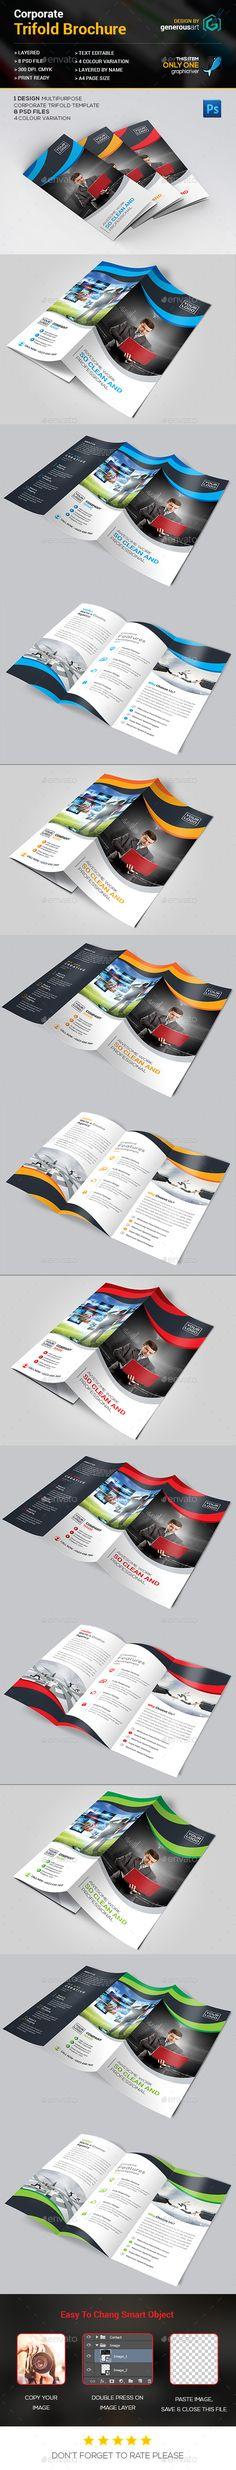 Fashion Lookbook Template  Fashion Lookbook Brochure Template